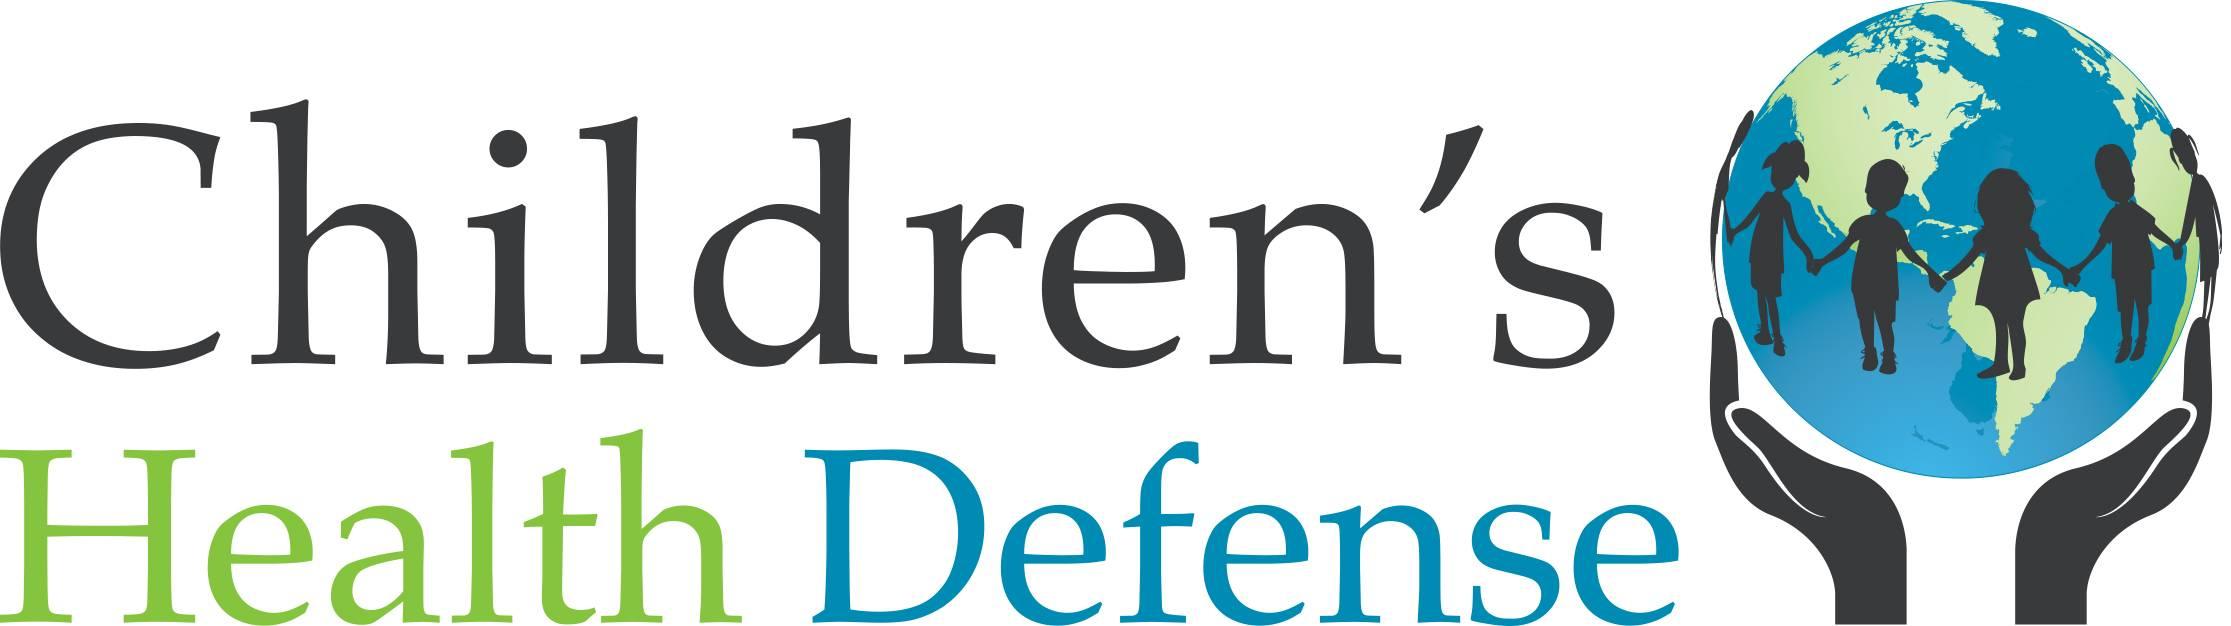 Logo of Children's Health Defense